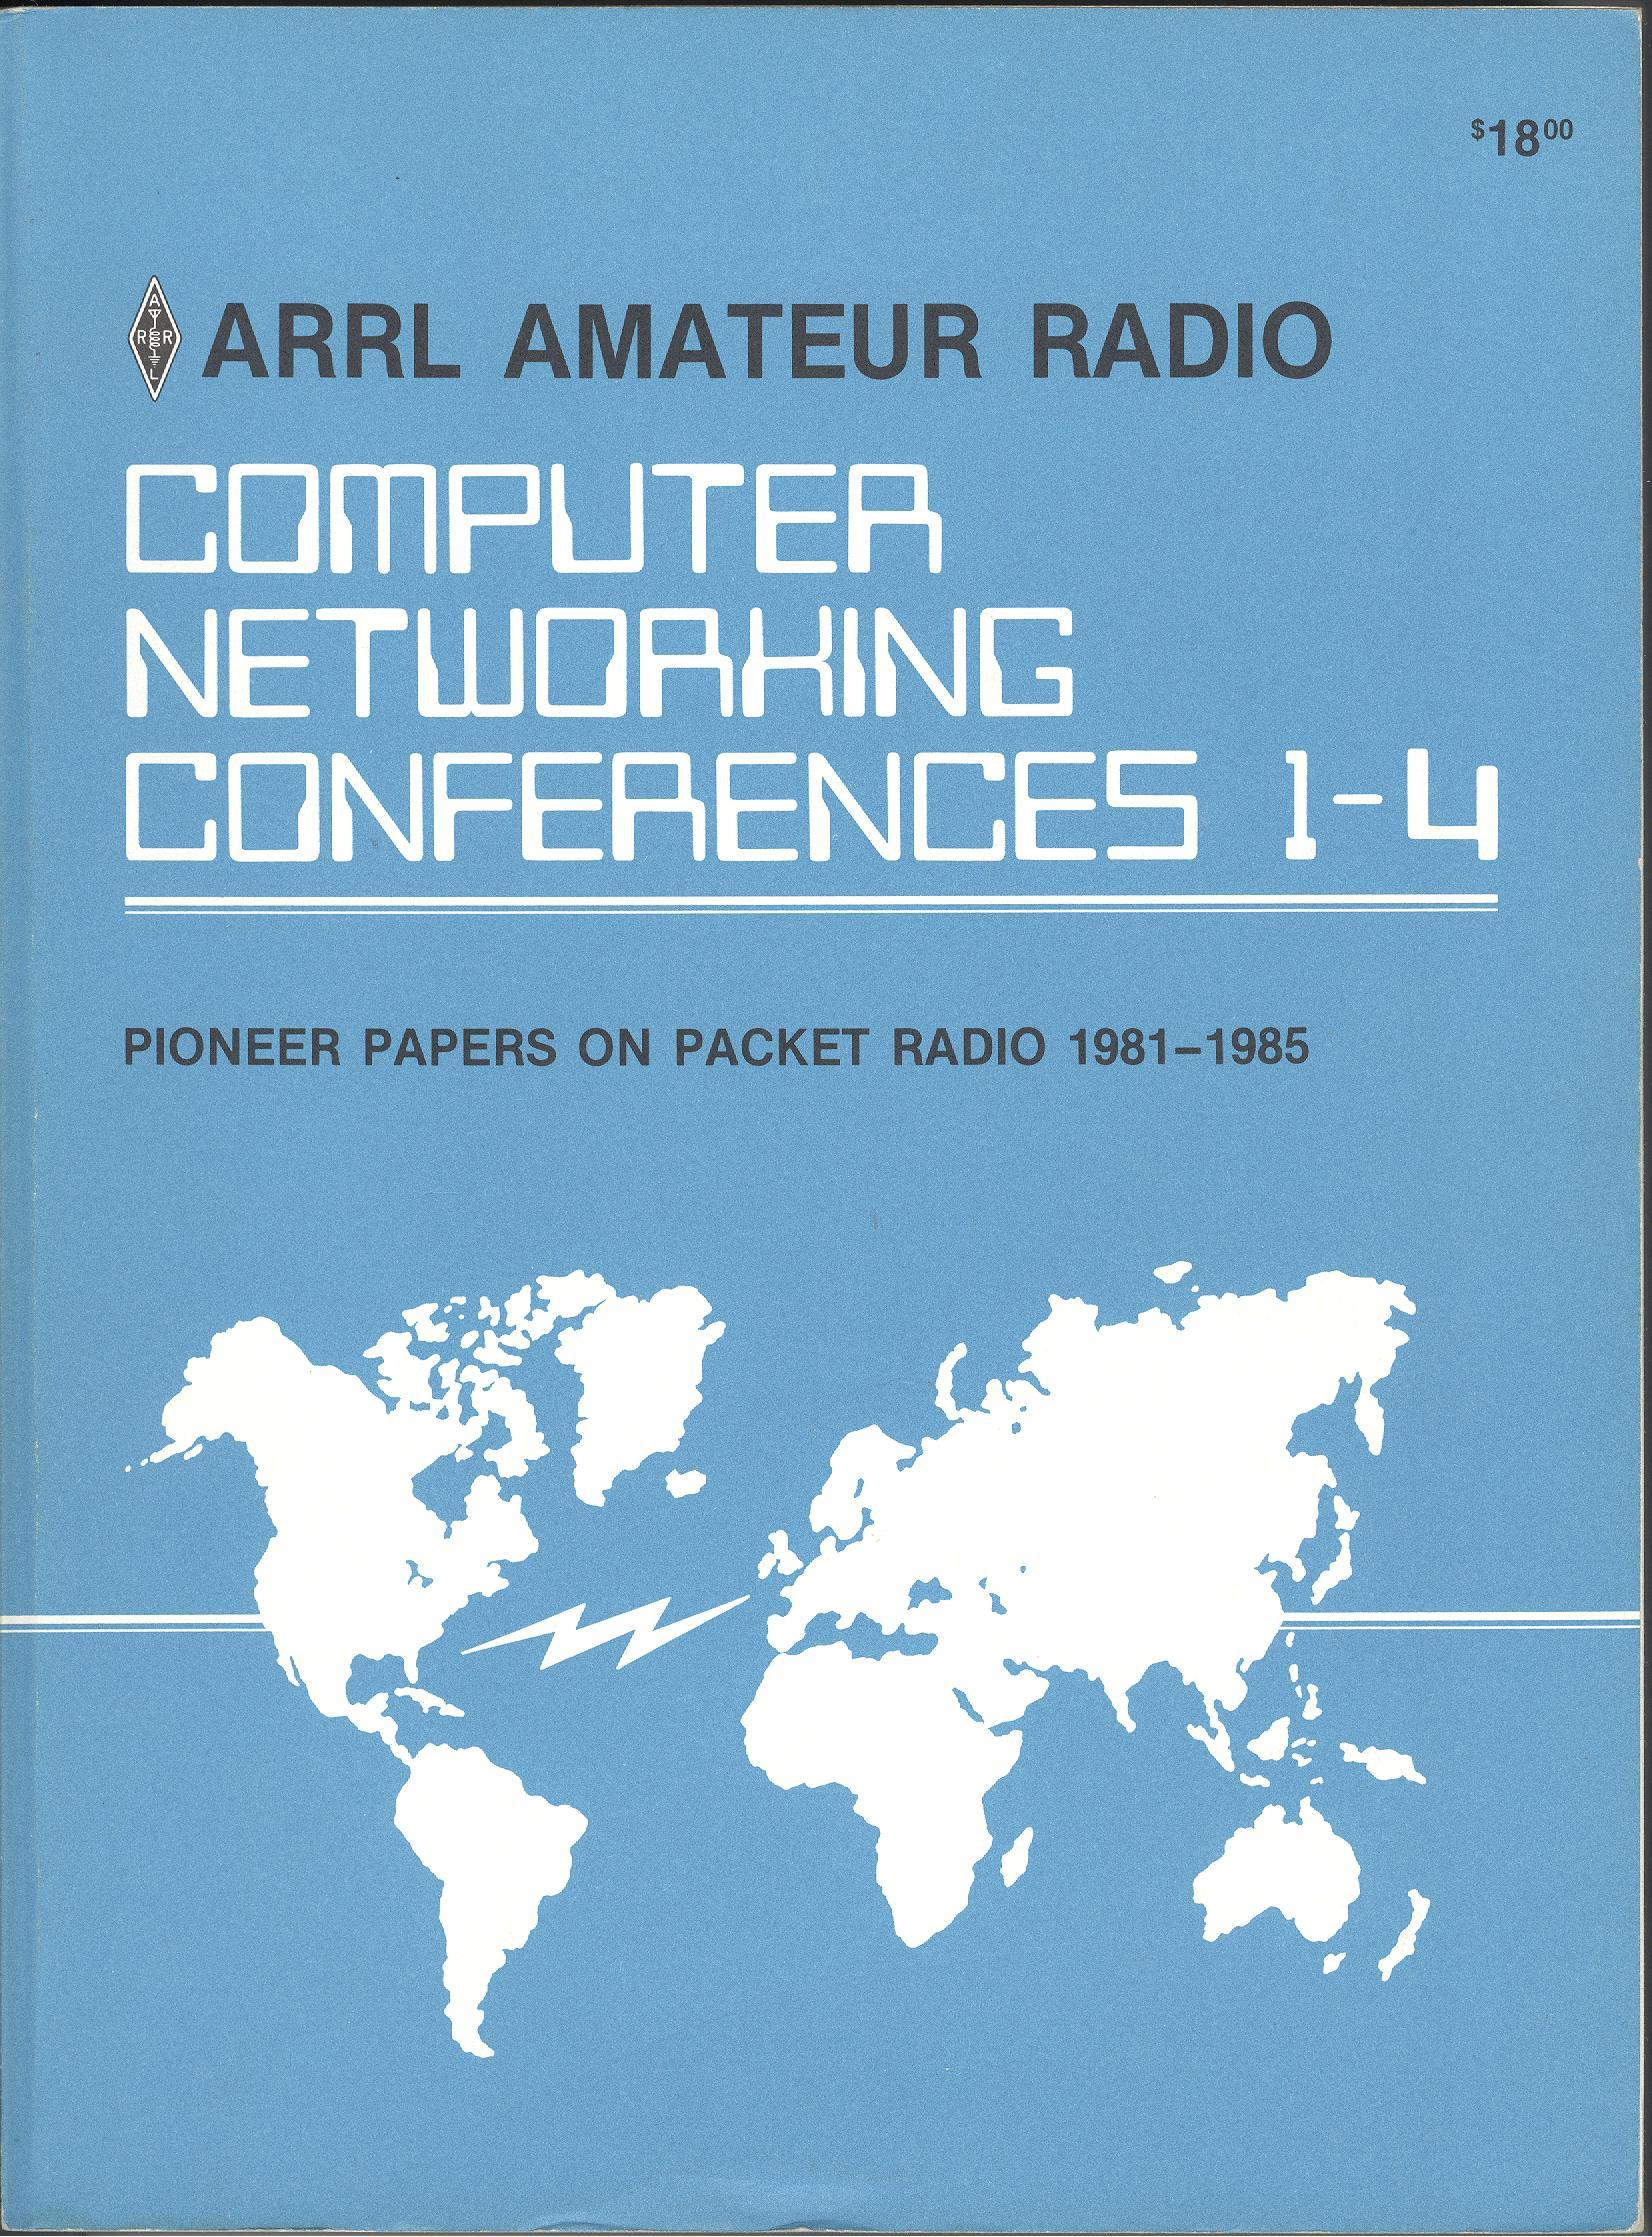 ARRL Amateur Radio Computer Networking Conferences 1 - 4